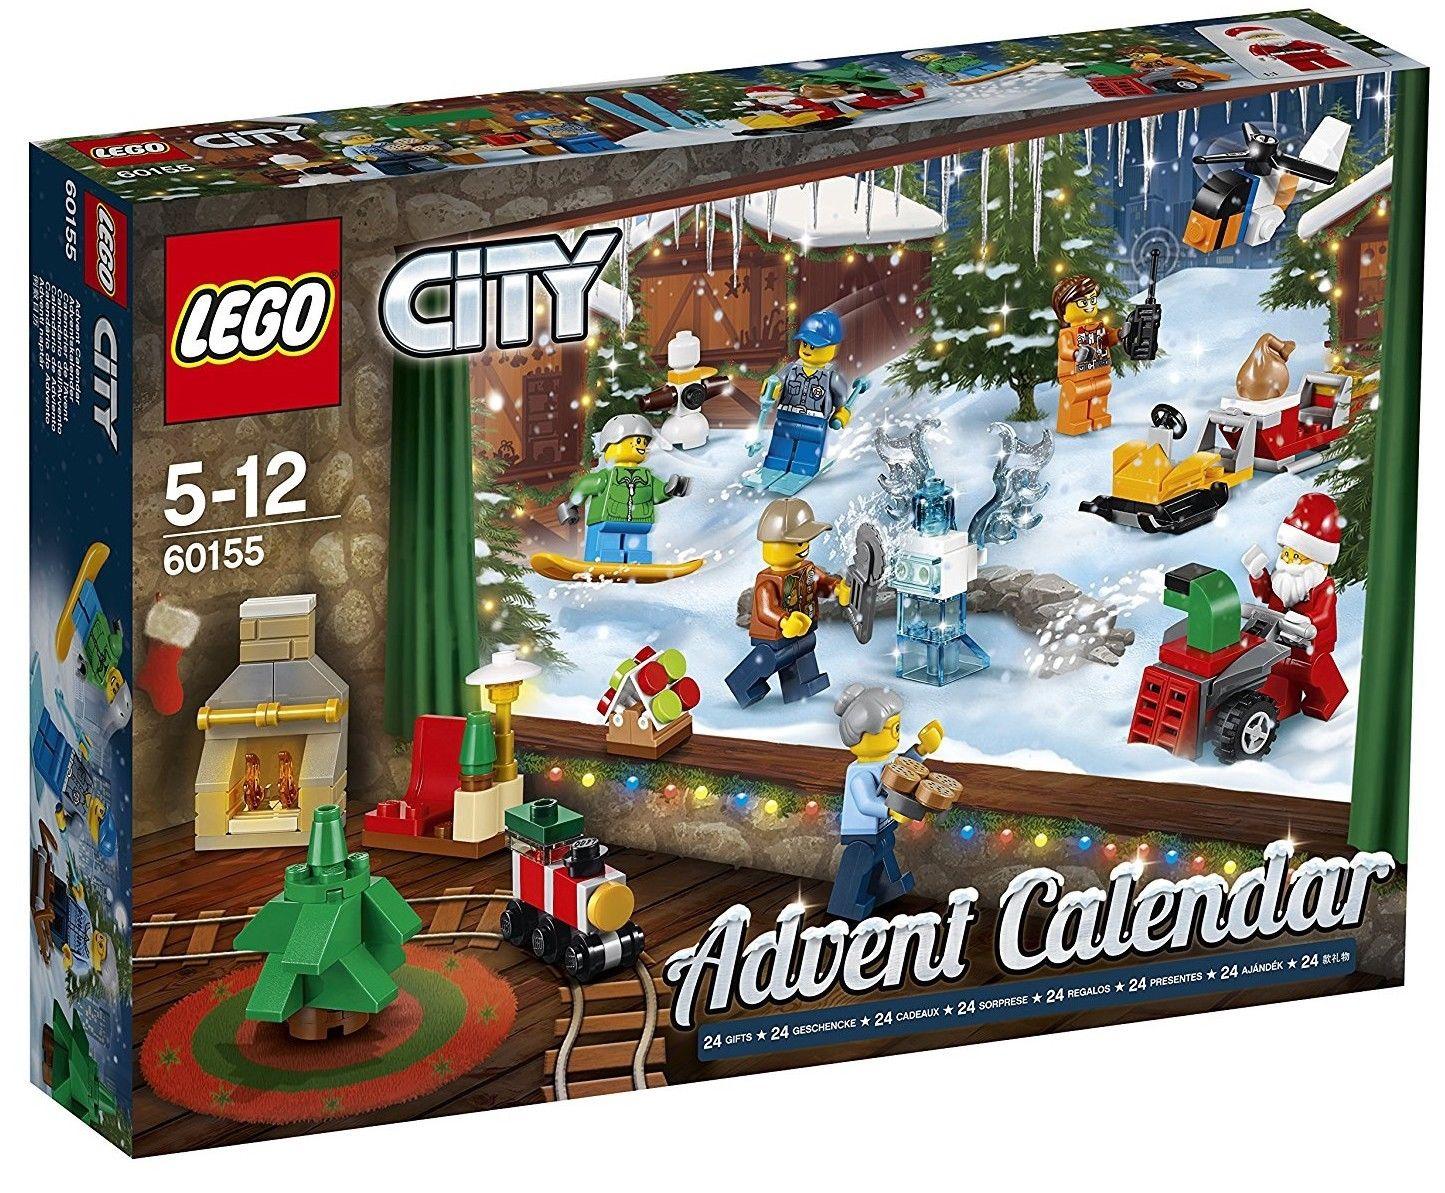 LEGO 60155 City Adventskalender nur 12,74 € inkl Versand